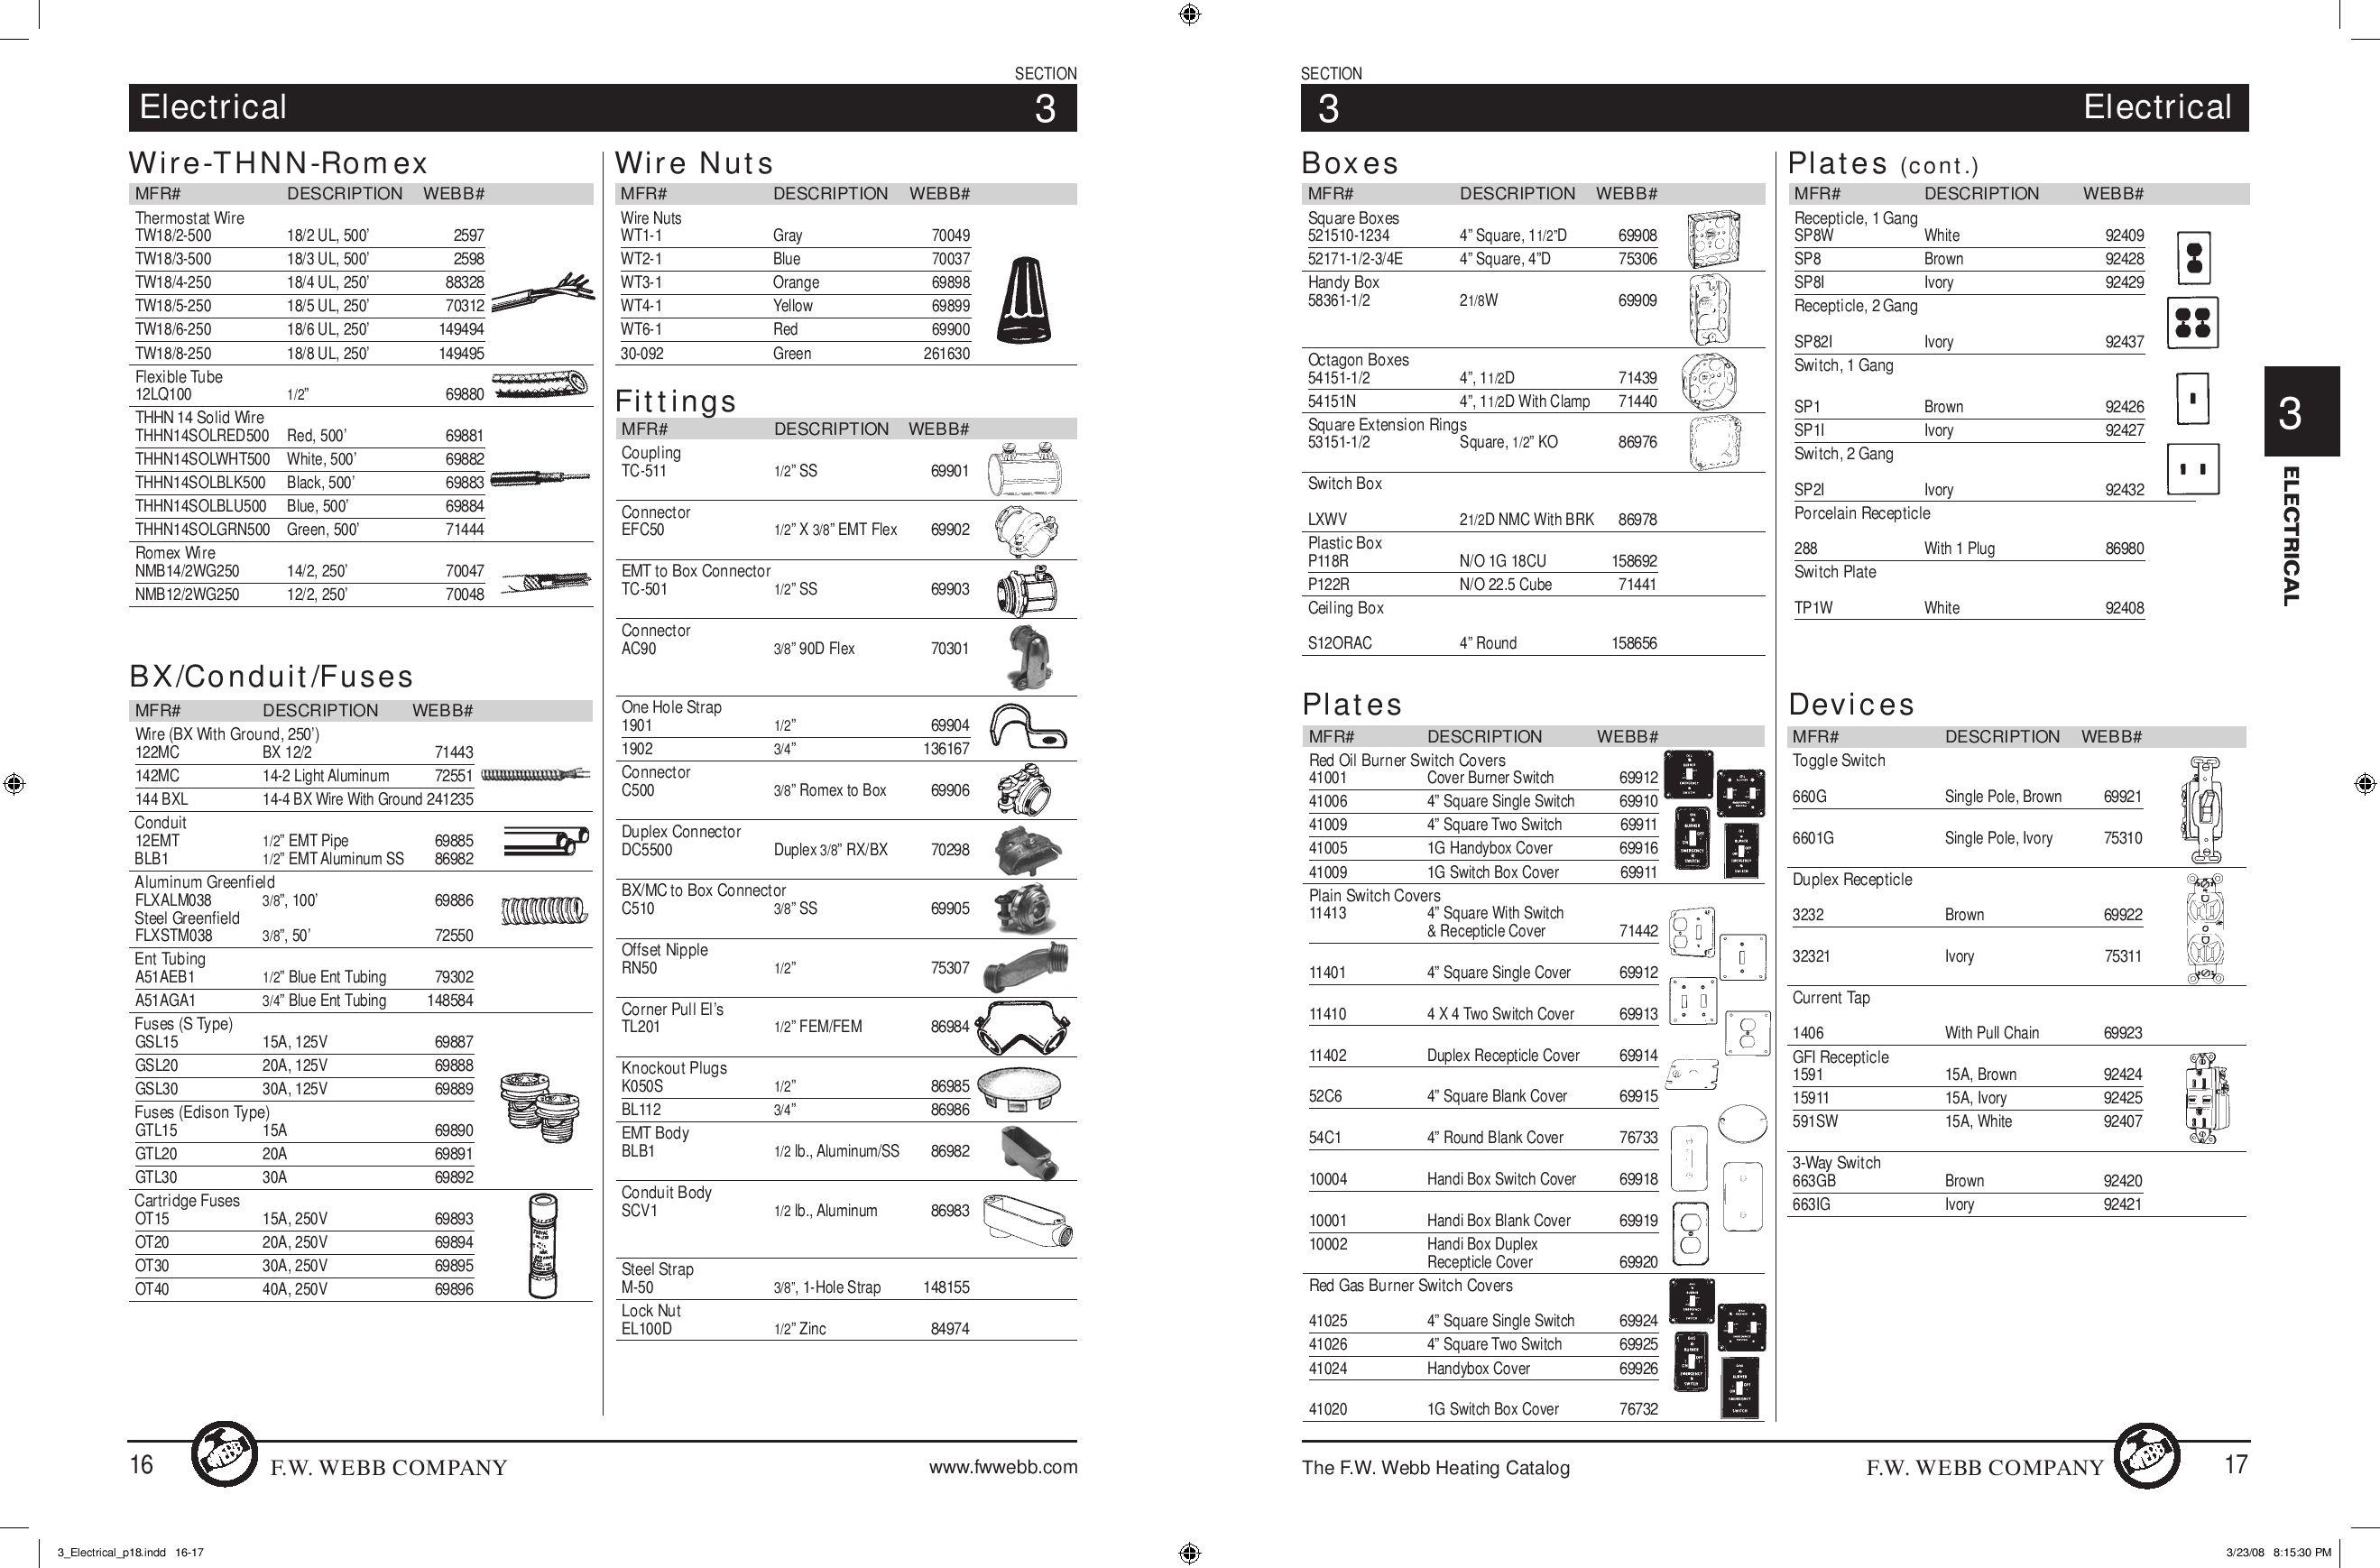 technician u0026 39 s heating catalog by f w  webb company